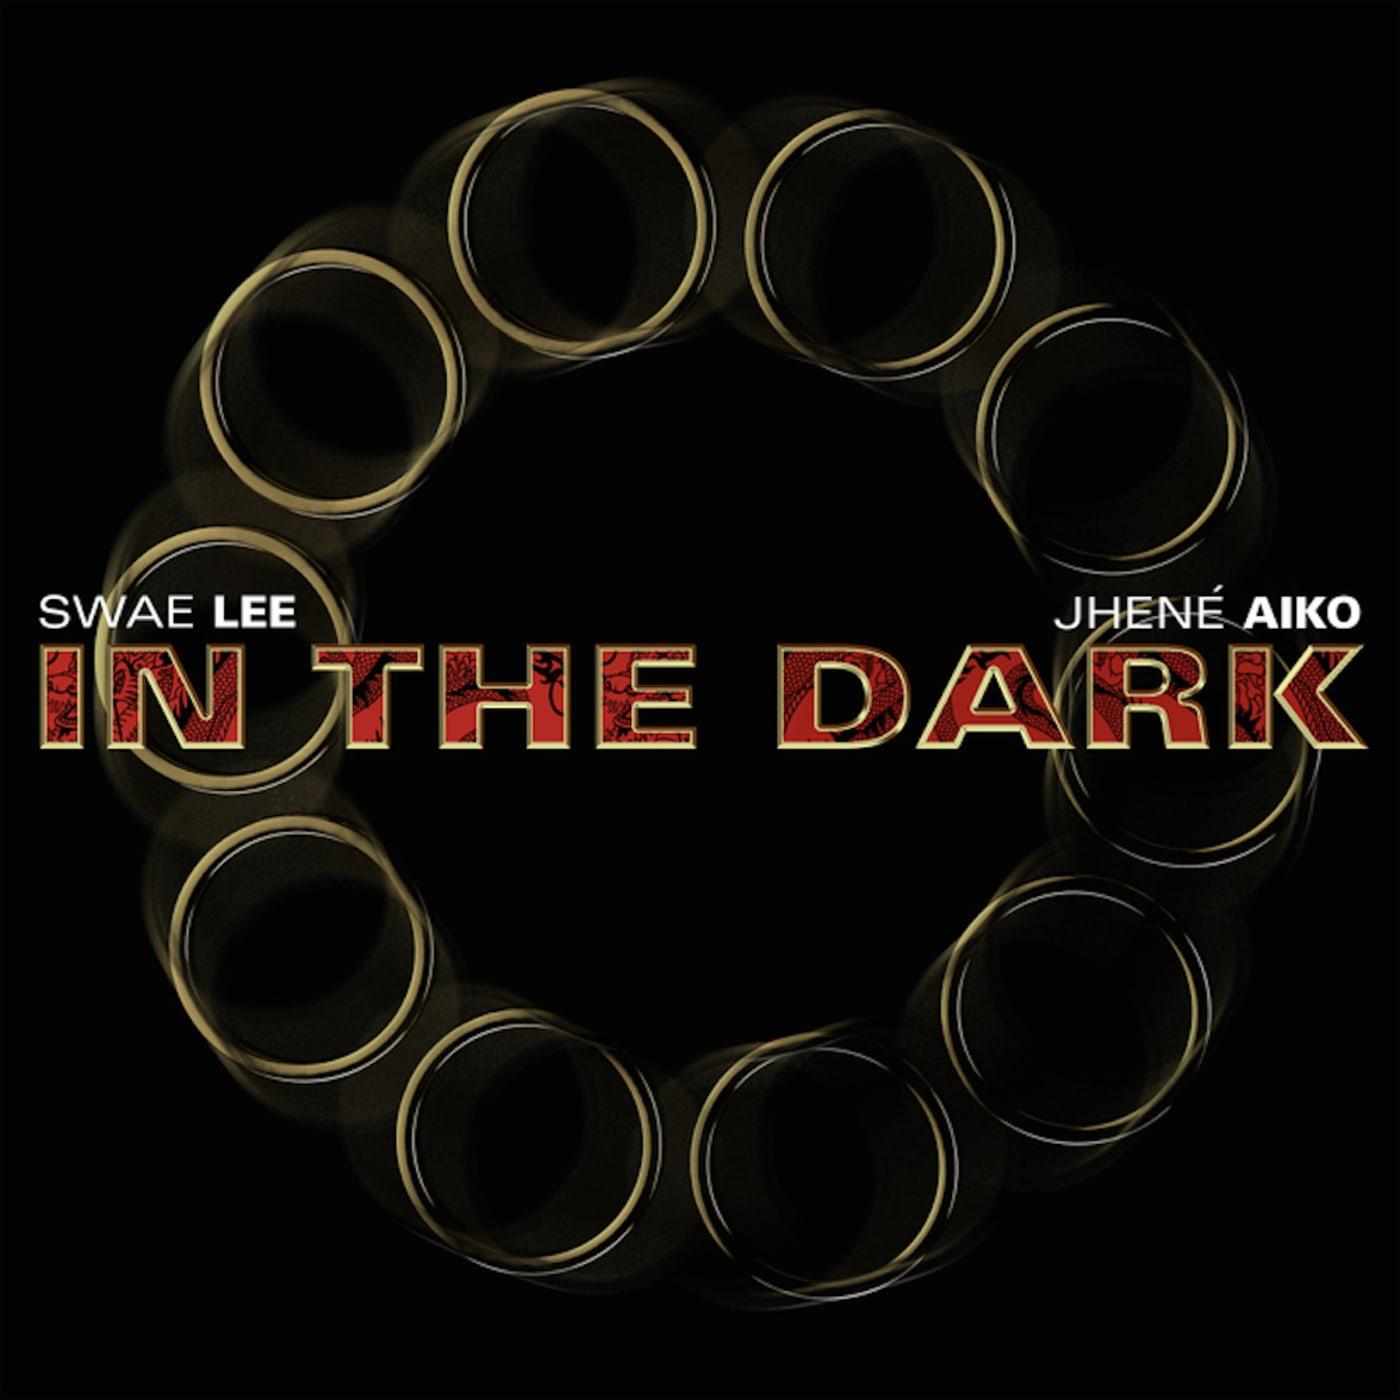 Swae Lee and Jhene Akio - In the Dark